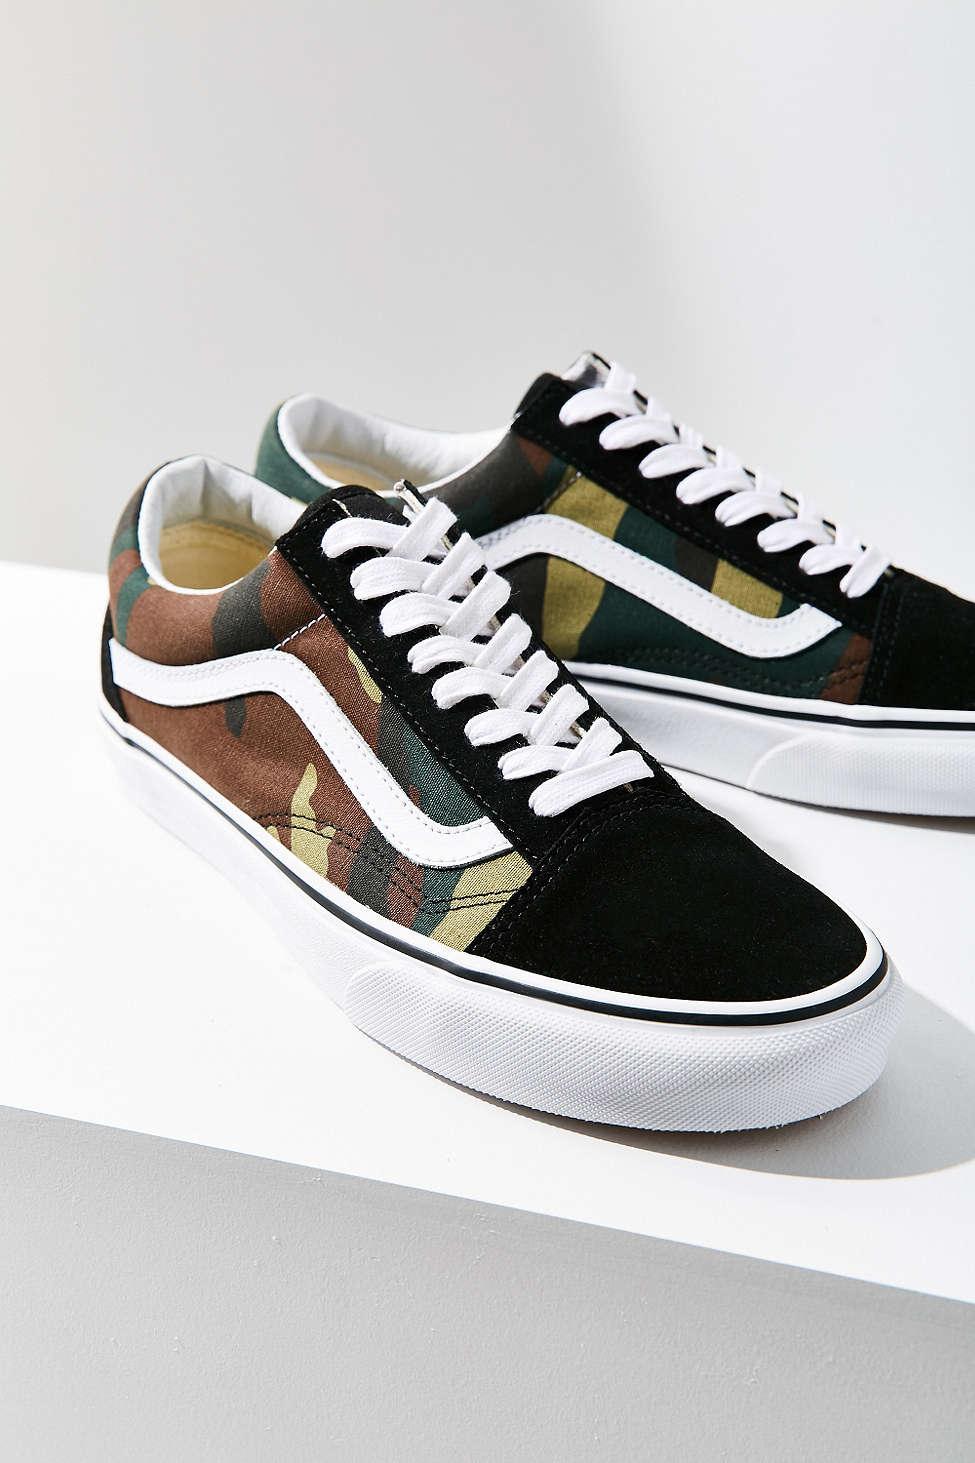 Vans X UO Camo Old Skool Sneaker. Urban Outfitters. $60.